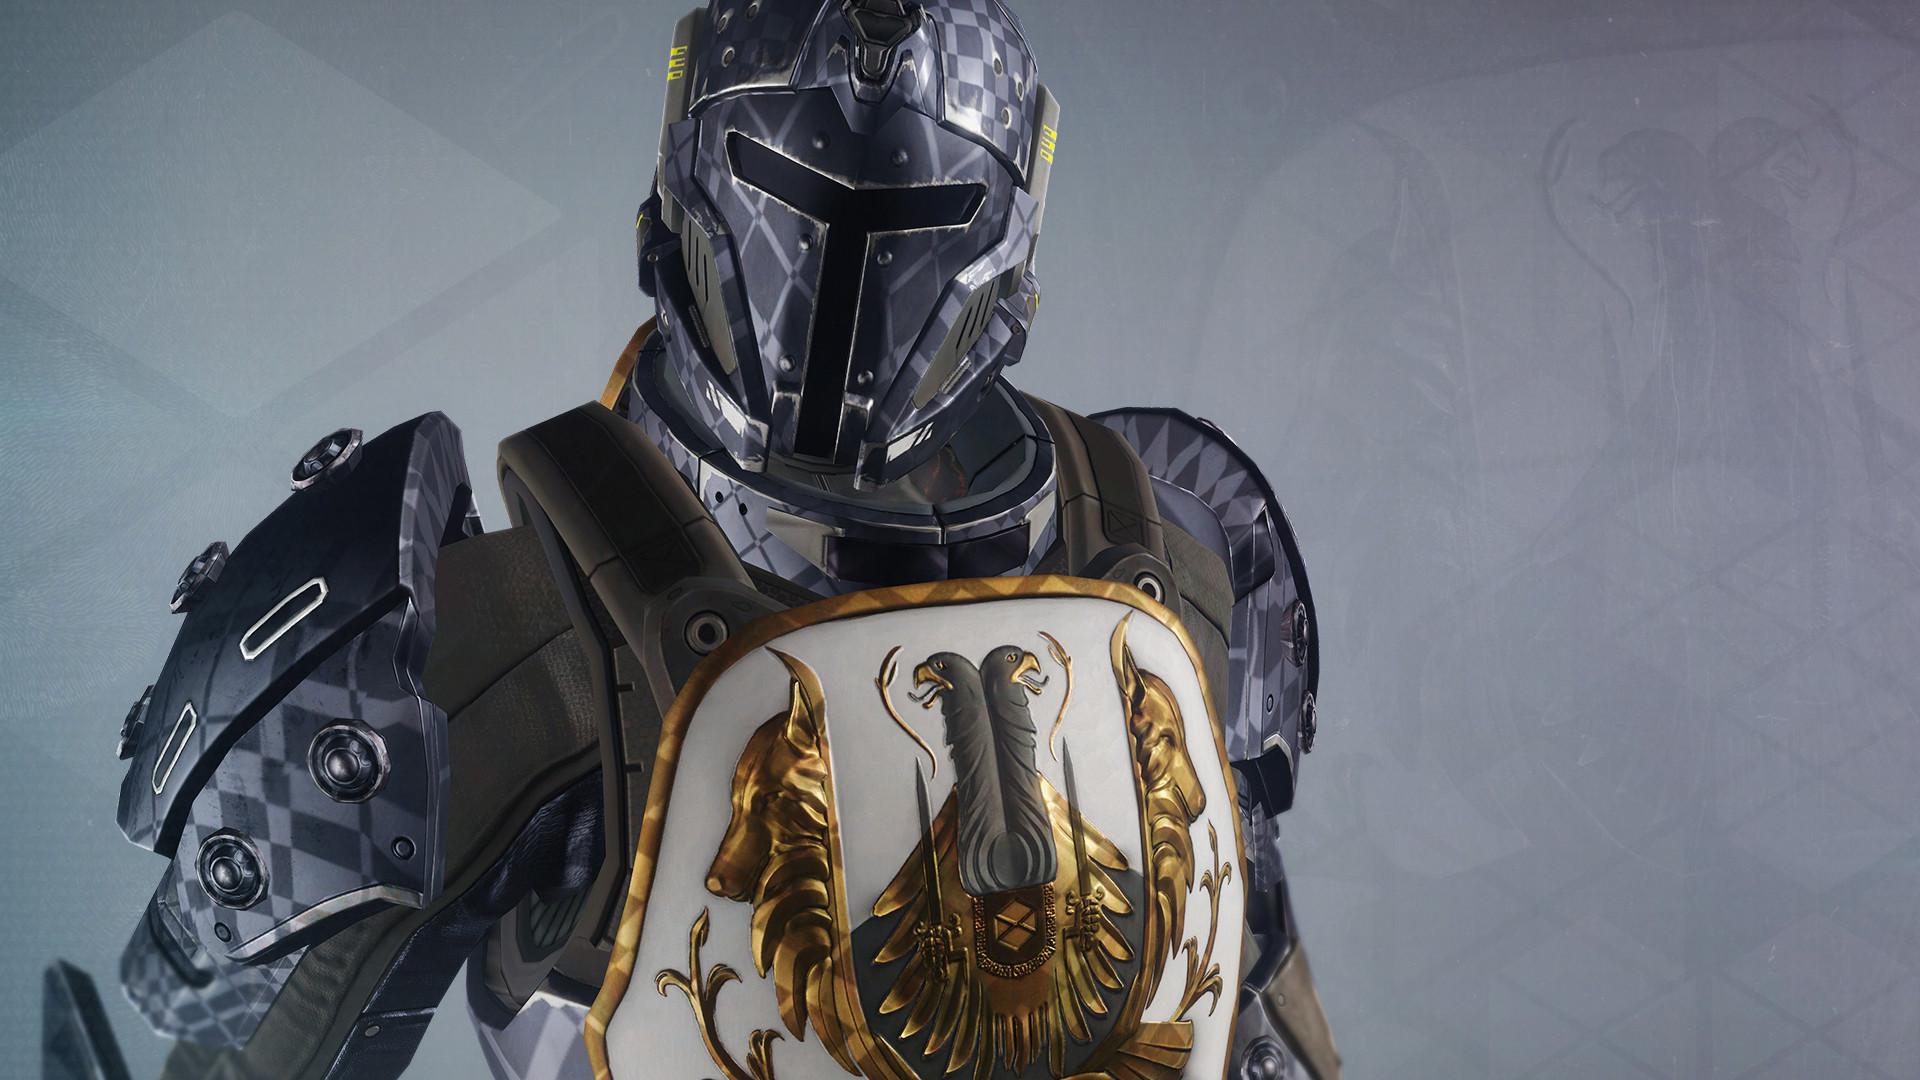 Legendary Titan Destiny game